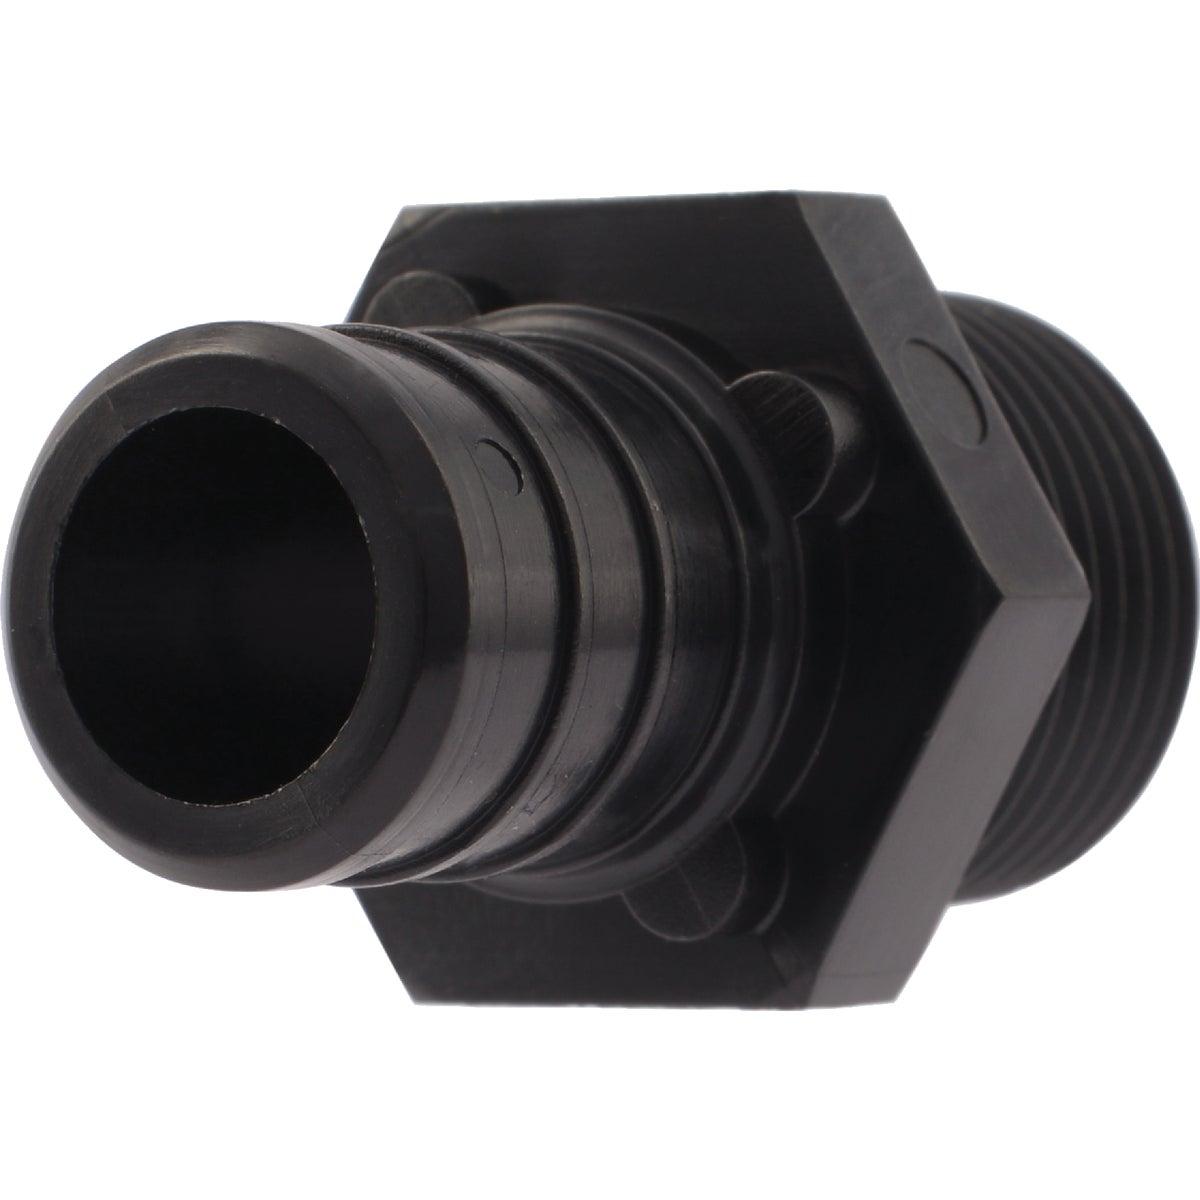 1/2CFX3/4MPT PLY ADAPTER - 12P-0812 by Watts Regulator Co